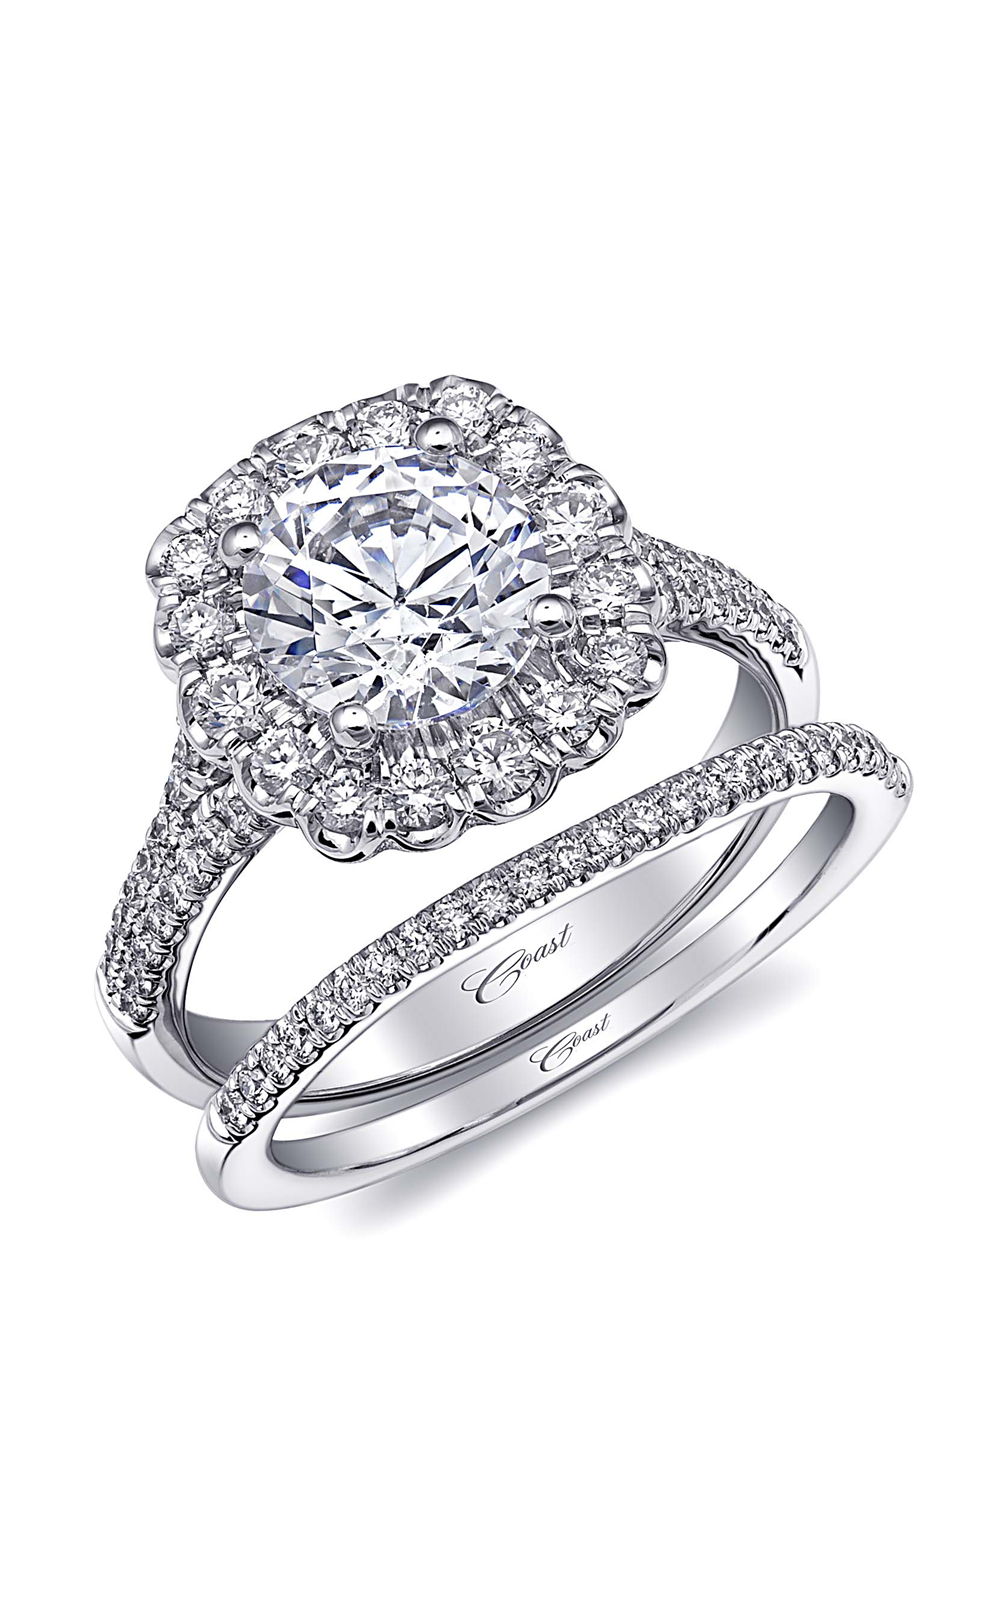 Coast Diamond Charisma LC10202 product image